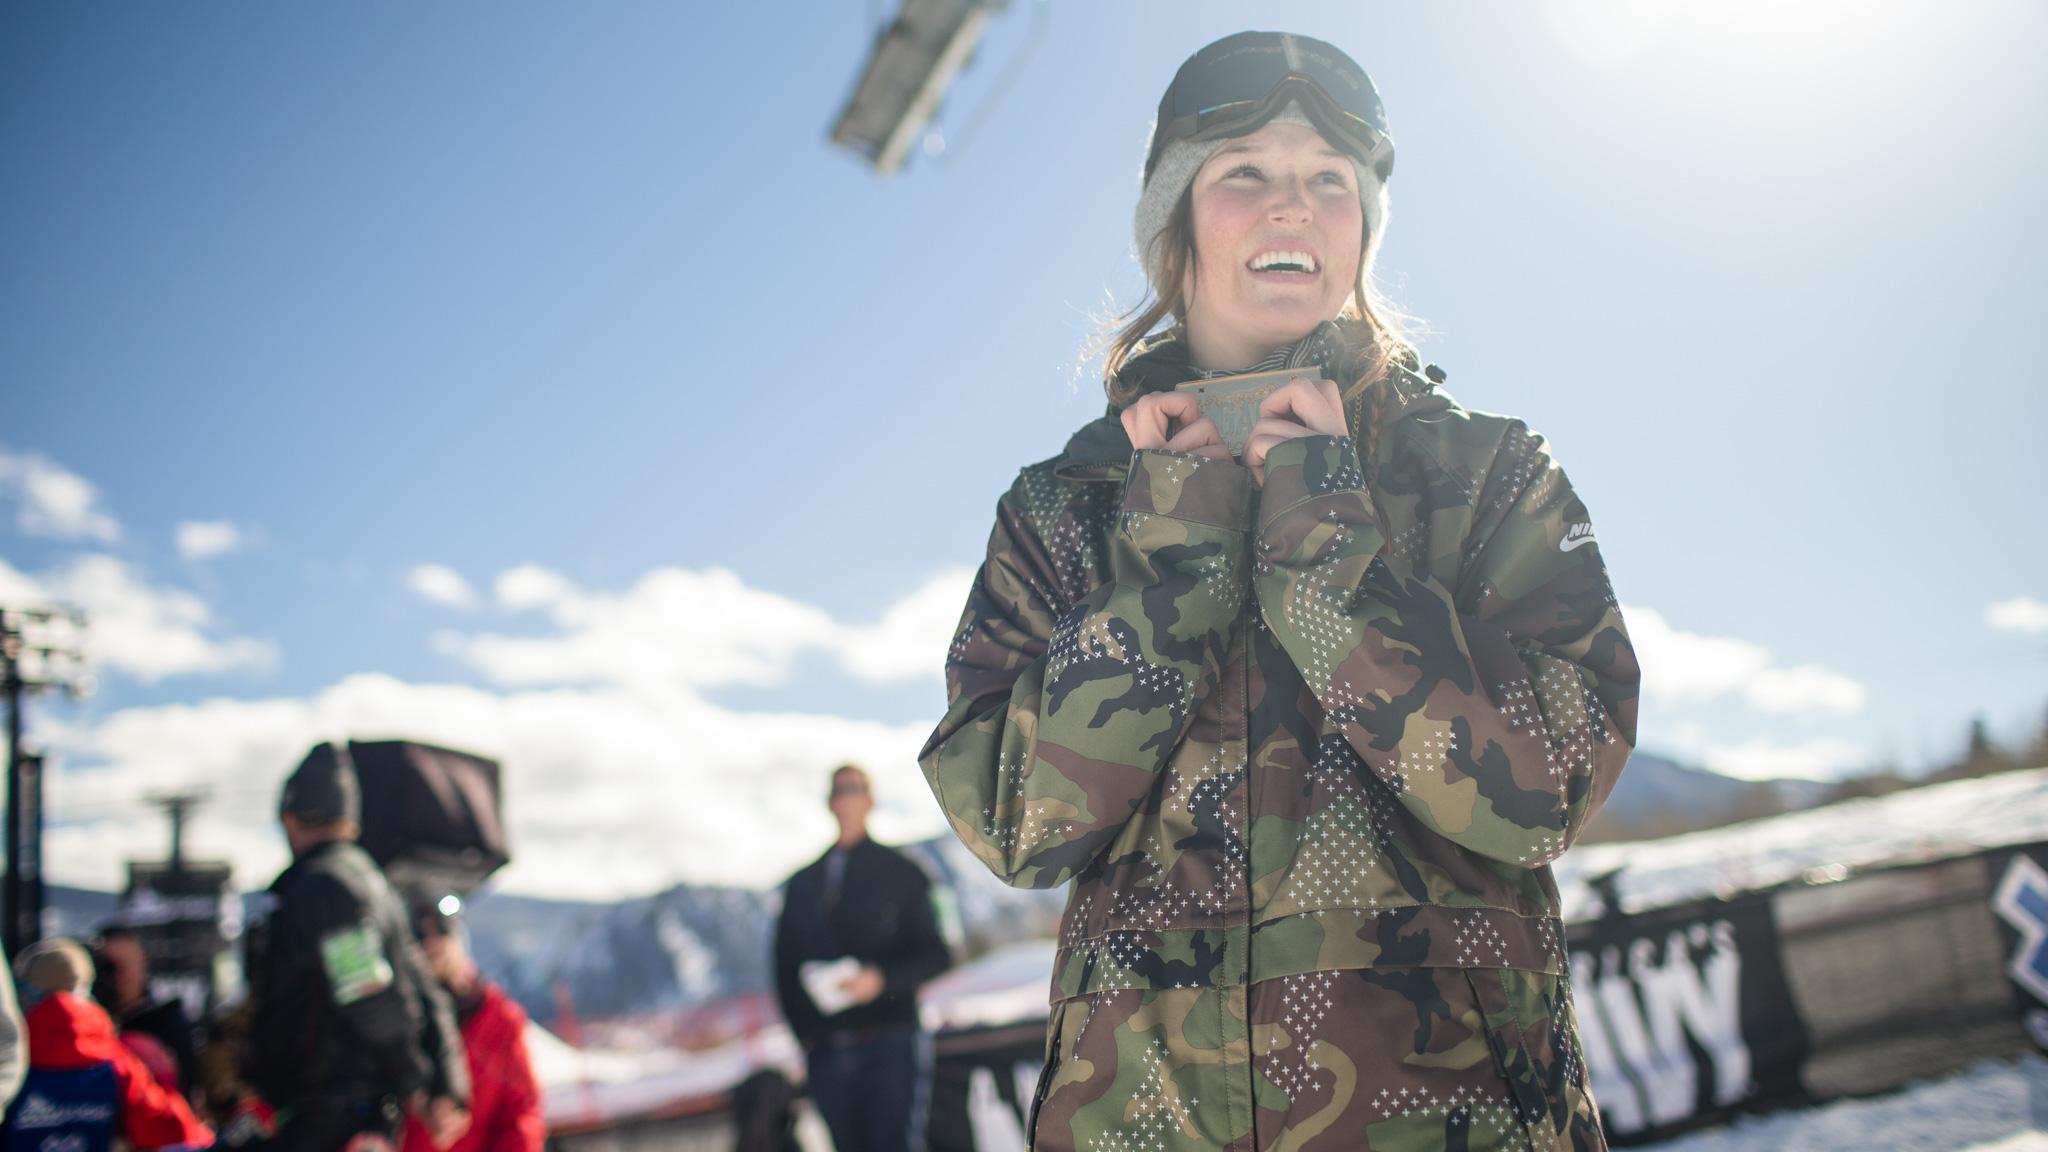 Women's Snowboard Slopestyle